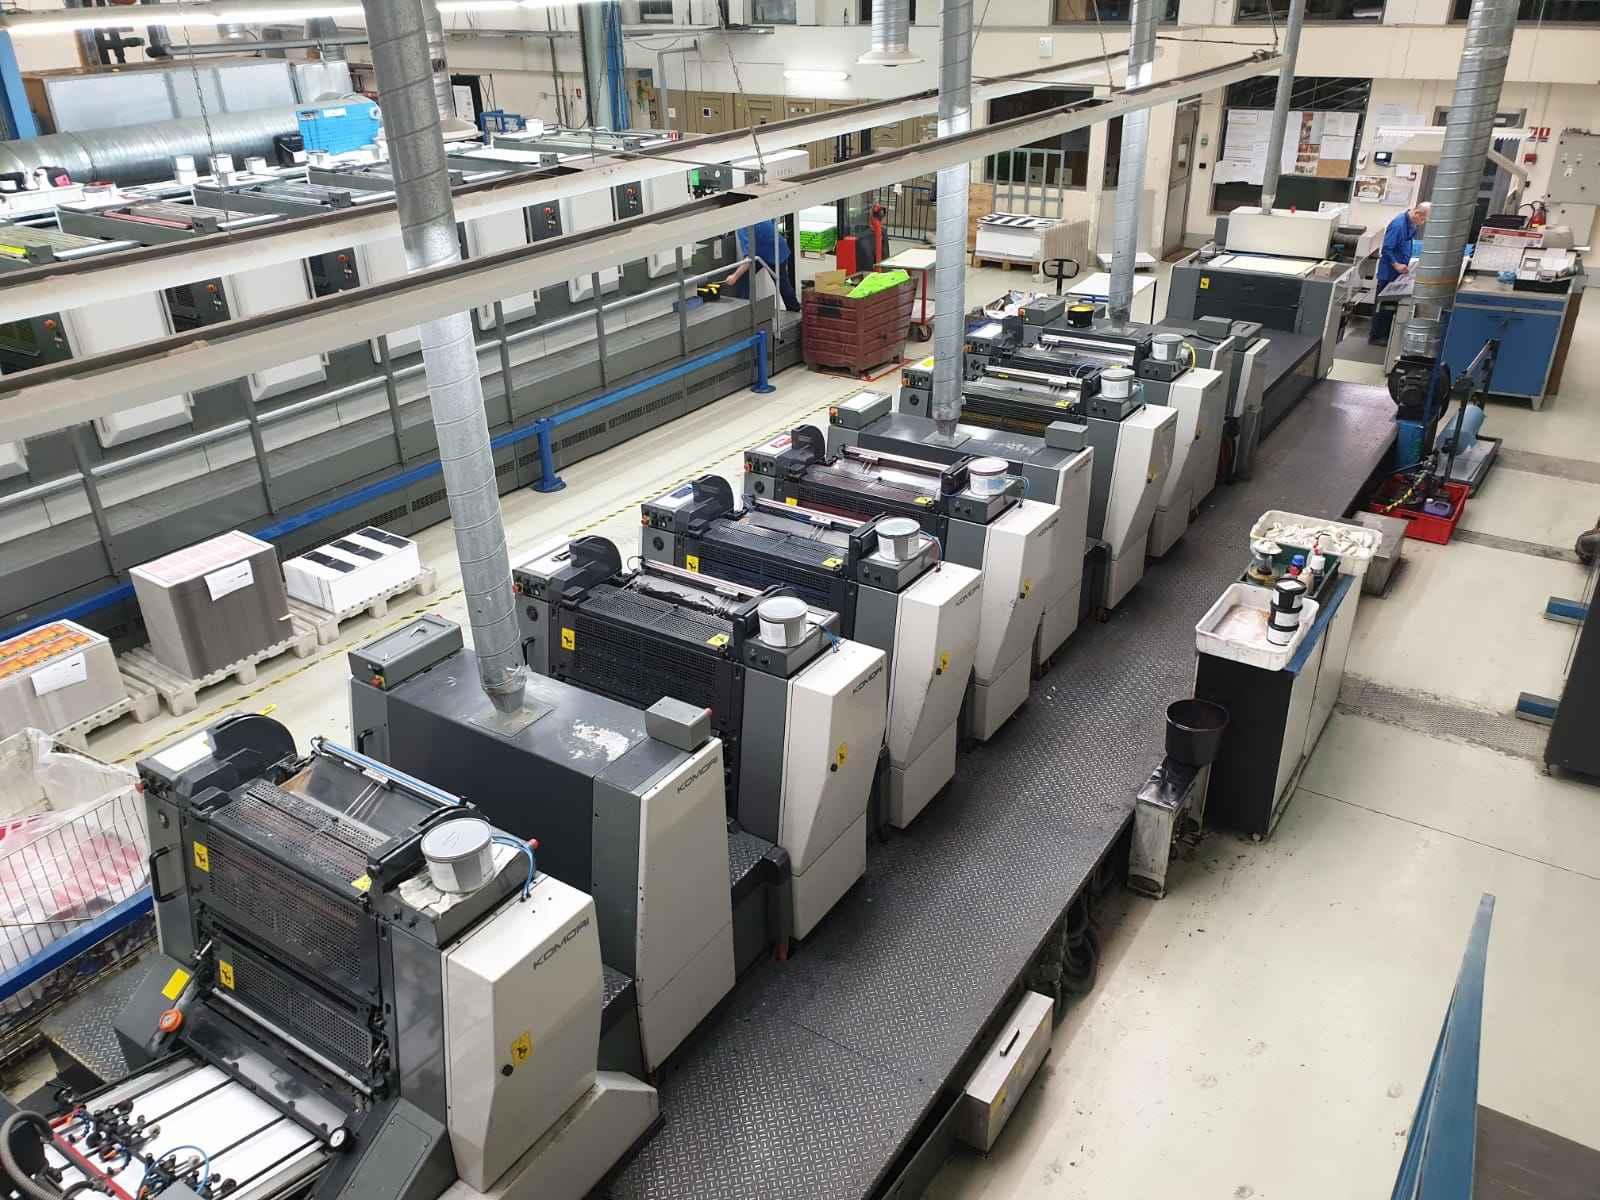 Офсетная печатная машина Komori L 628+C (1+DU+2+3+4+DU+5+6+DU+L+X) фото на Industry-Pilot